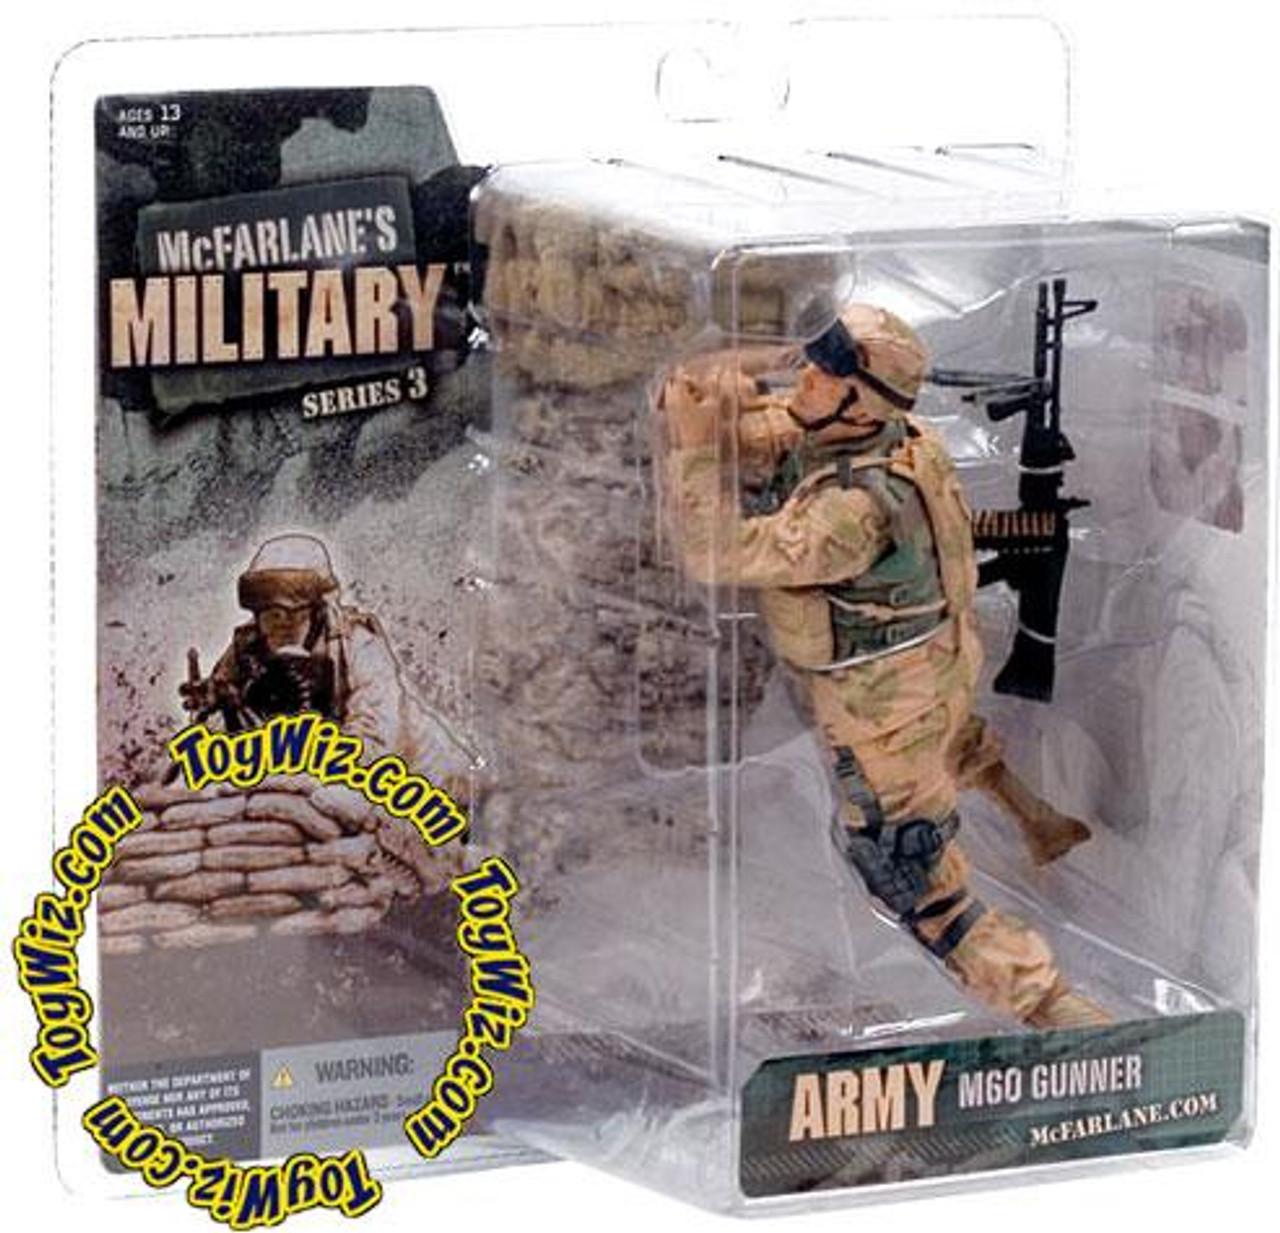 McFarlane Toys Military Series 3 Army M60 Gunner Action Figure [Random Ethnicity]